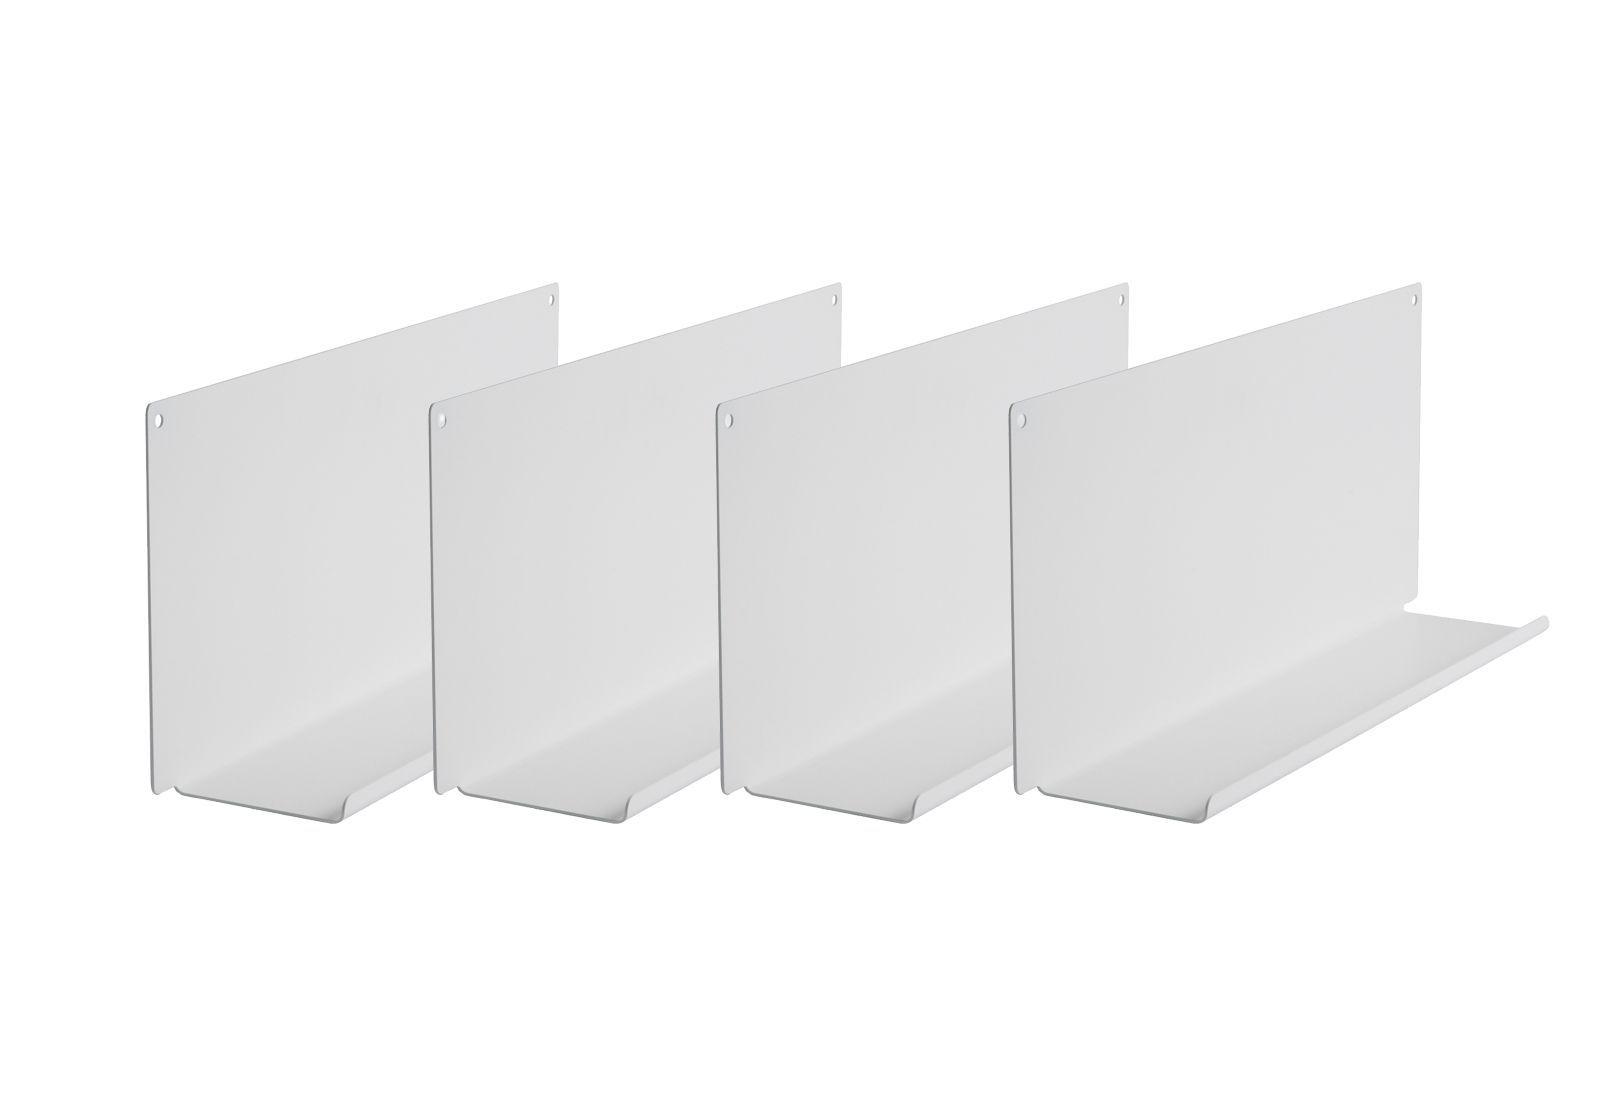 tag re cadres photo le lot de 2 45x10 cm blanc acier. Black Bedroom Furniture Sets. Home Design Ideas